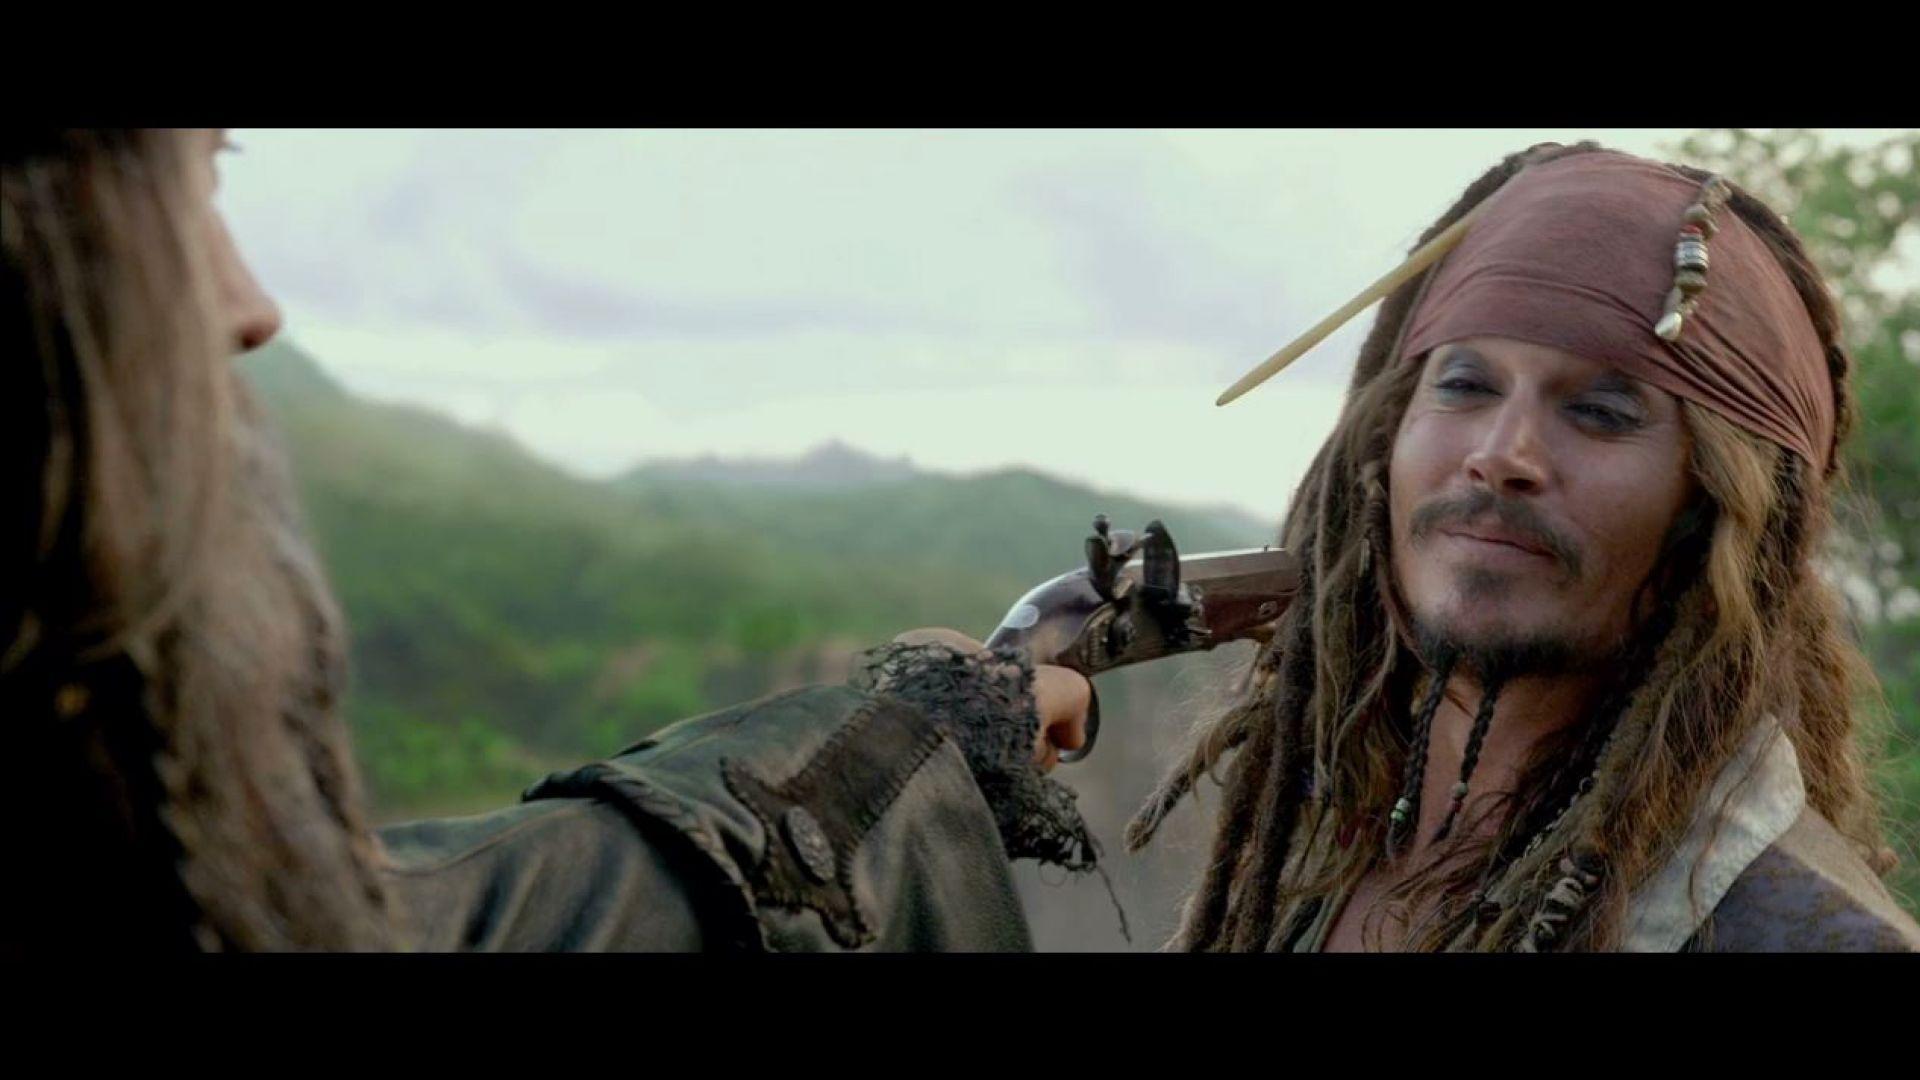 Blackbeard has six guns but two shots, Pirates 4